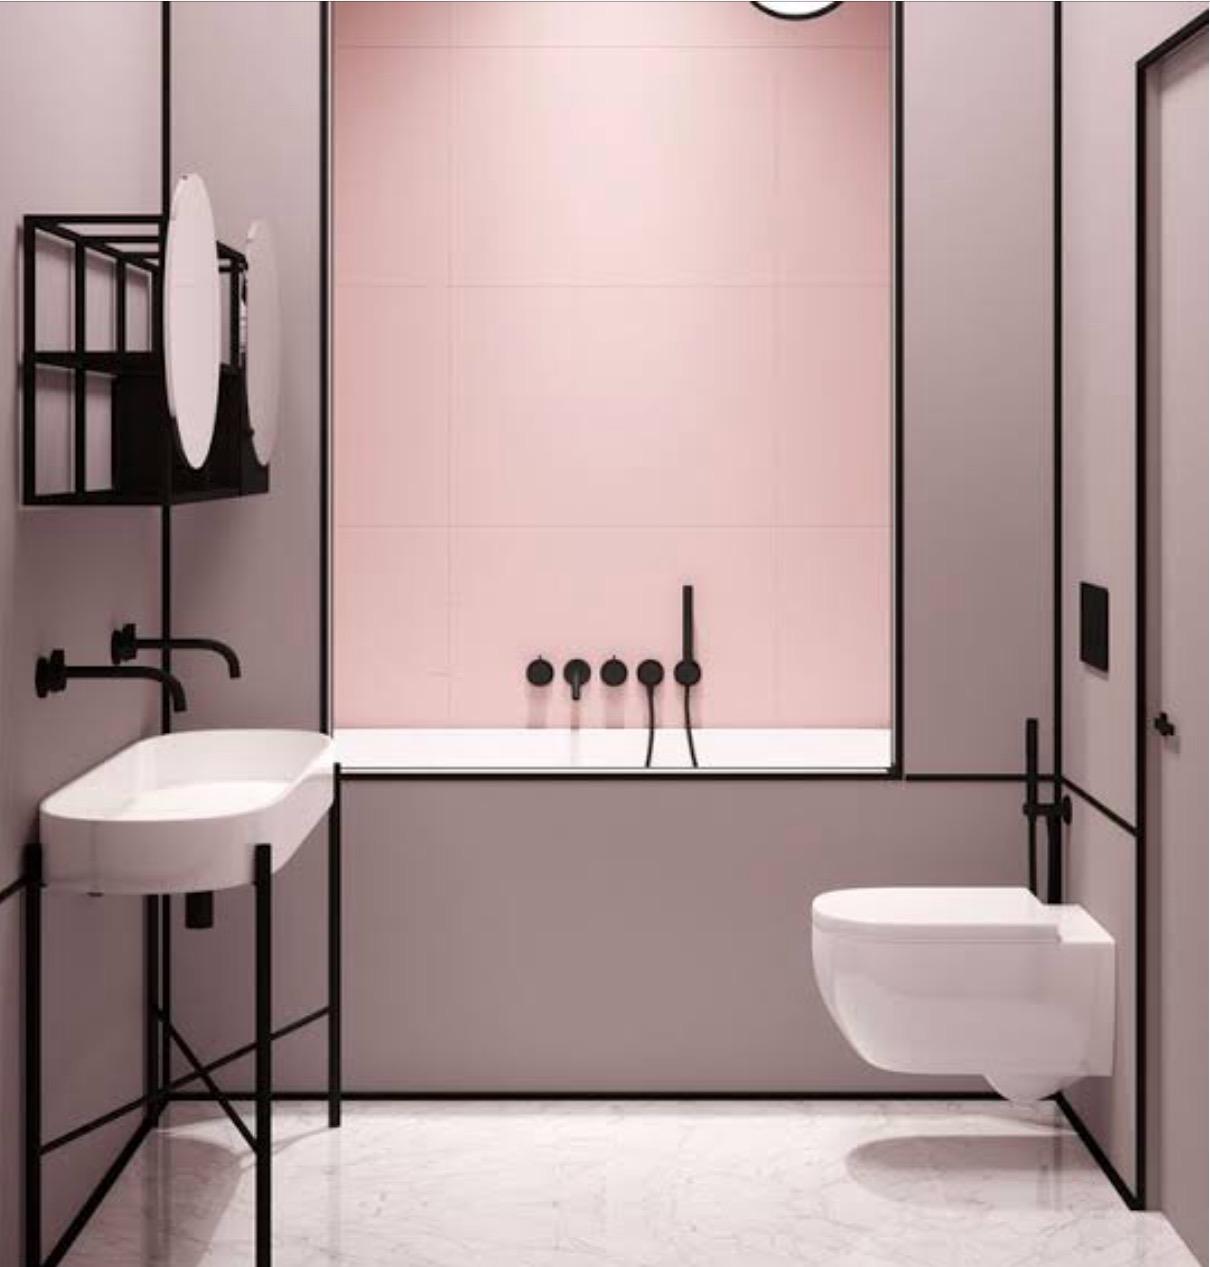 pink and blush - This inspiring bathroom makes pink sing!